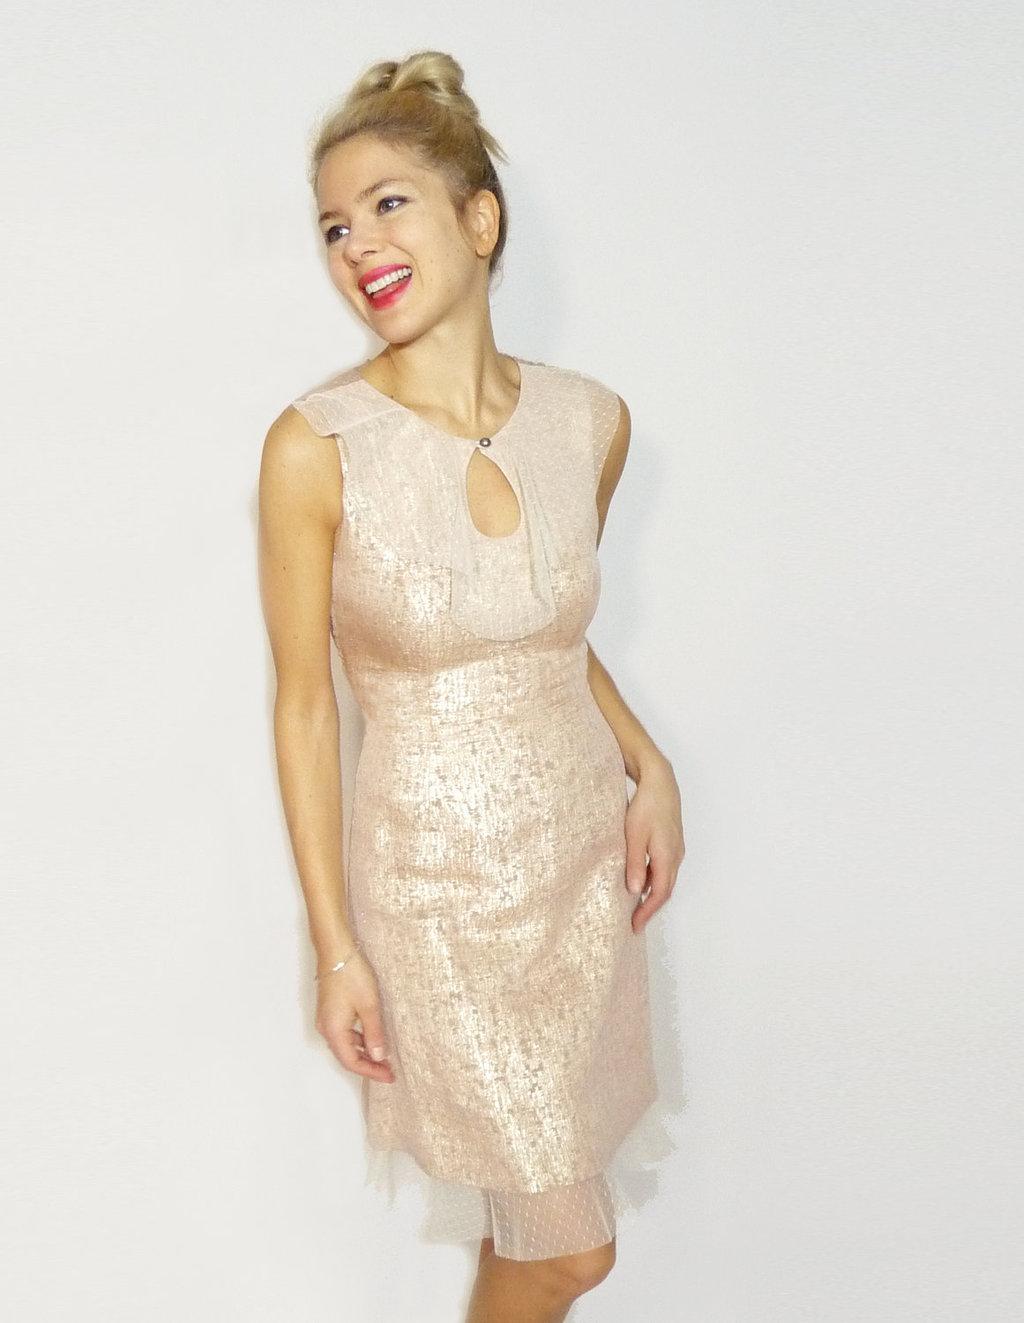 Beautiful-bridesmaid-dresses-from-etsy-bridal-party-attire-metallic-blush-pink.full